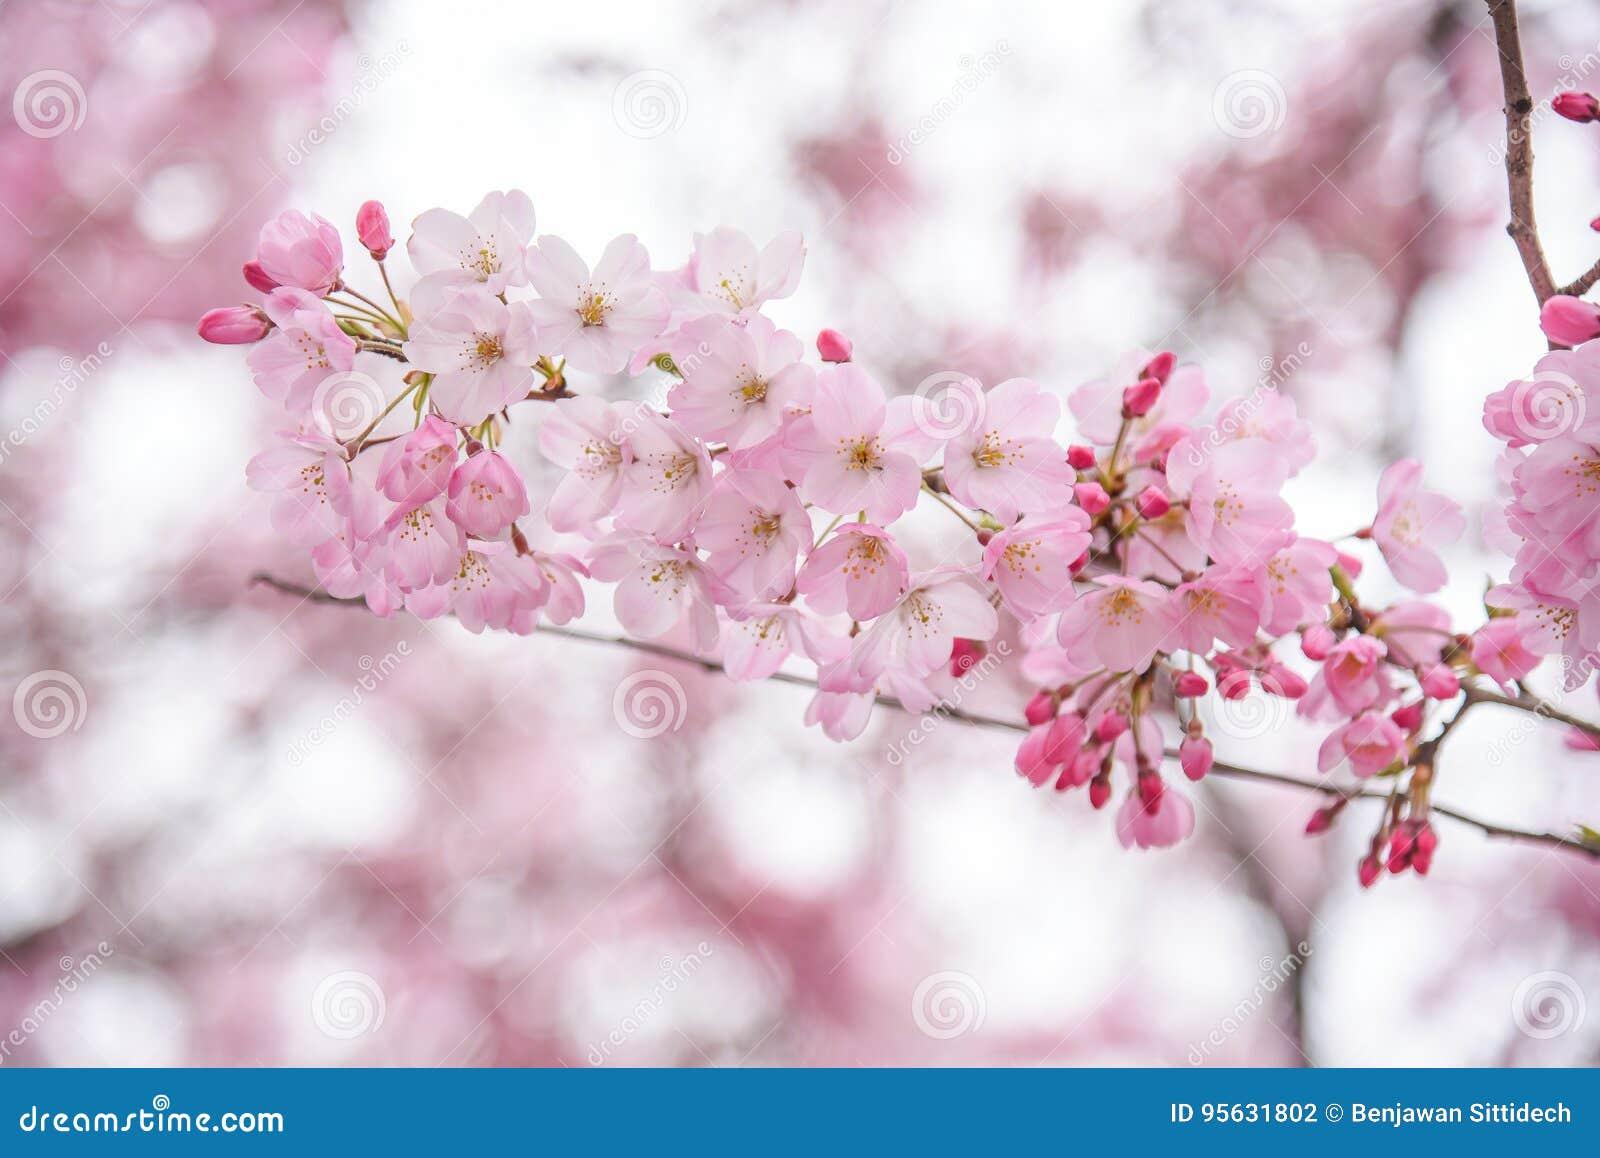 Japanese cherry blossom or pink sakura flower stock photo image of download japanese cherry blossom or pink sakura flower stock photo image of abstract bloom mightylinksfo